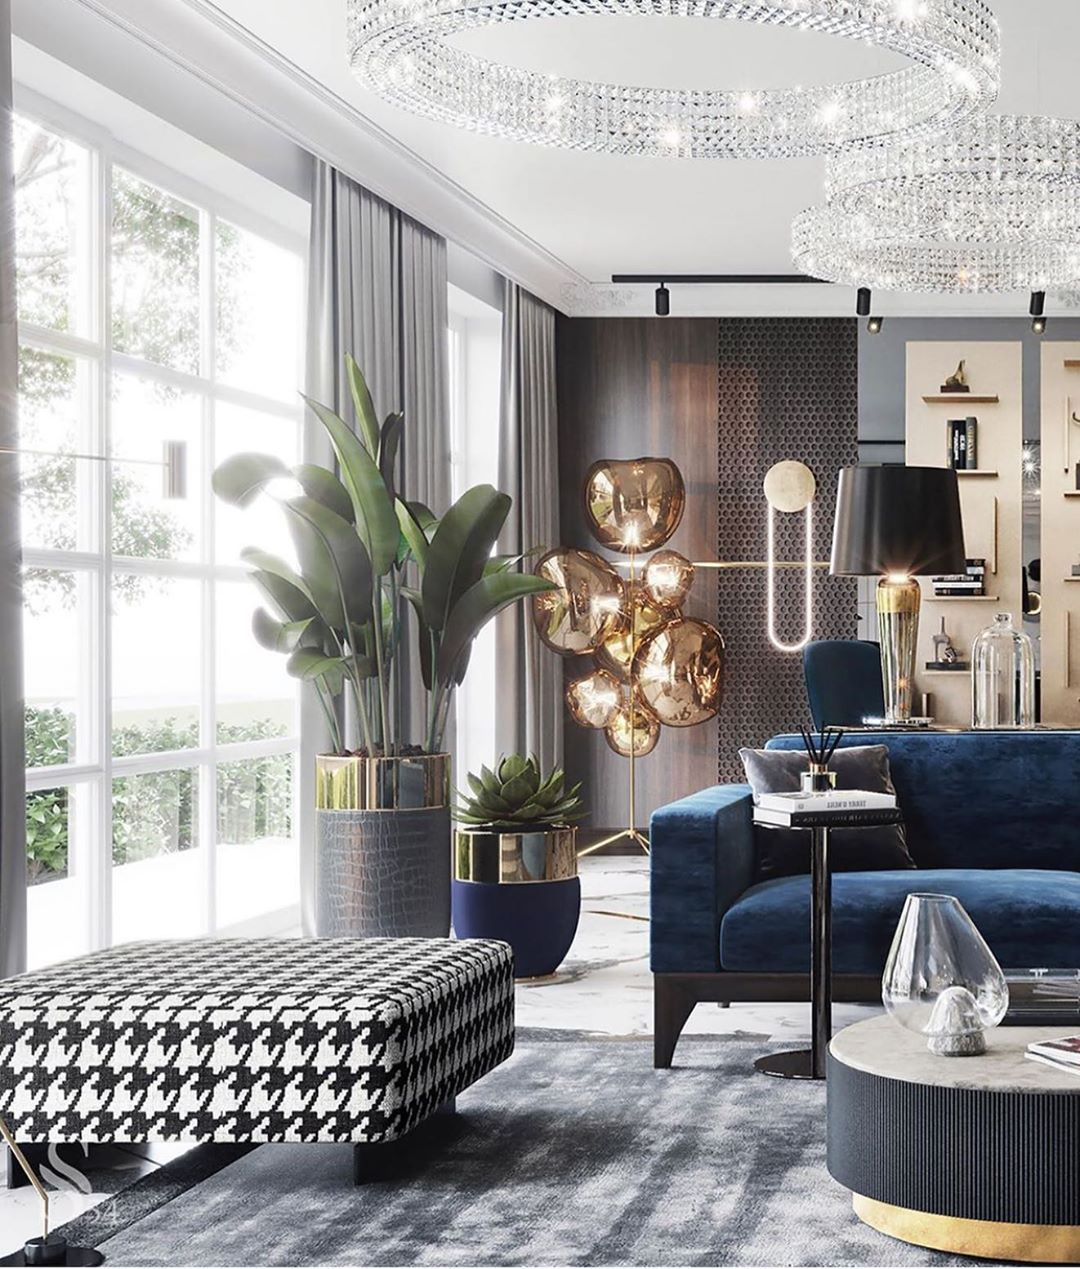 T H I Interiors On Instagram Layers Of Excitement Studia 54 Art Interiors I Luxury Living Room Living Room Designs Interior Design Living Room